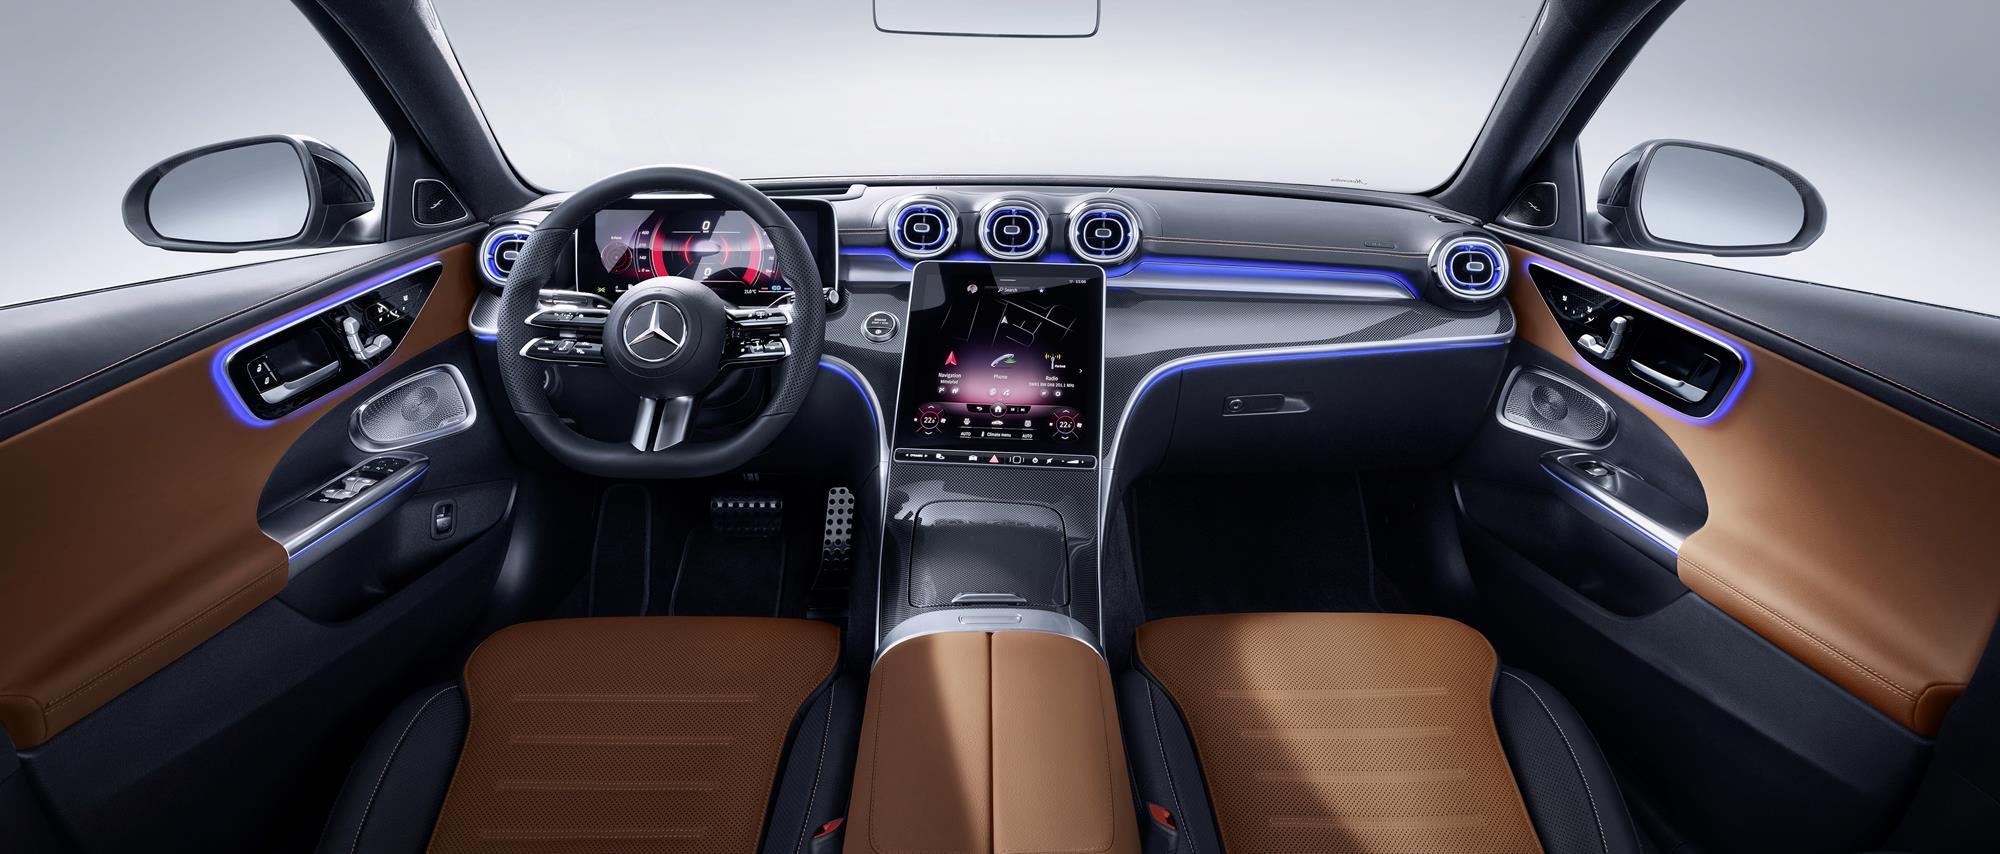 Mercedes-Benz-Classe-C-2022-31.jpg